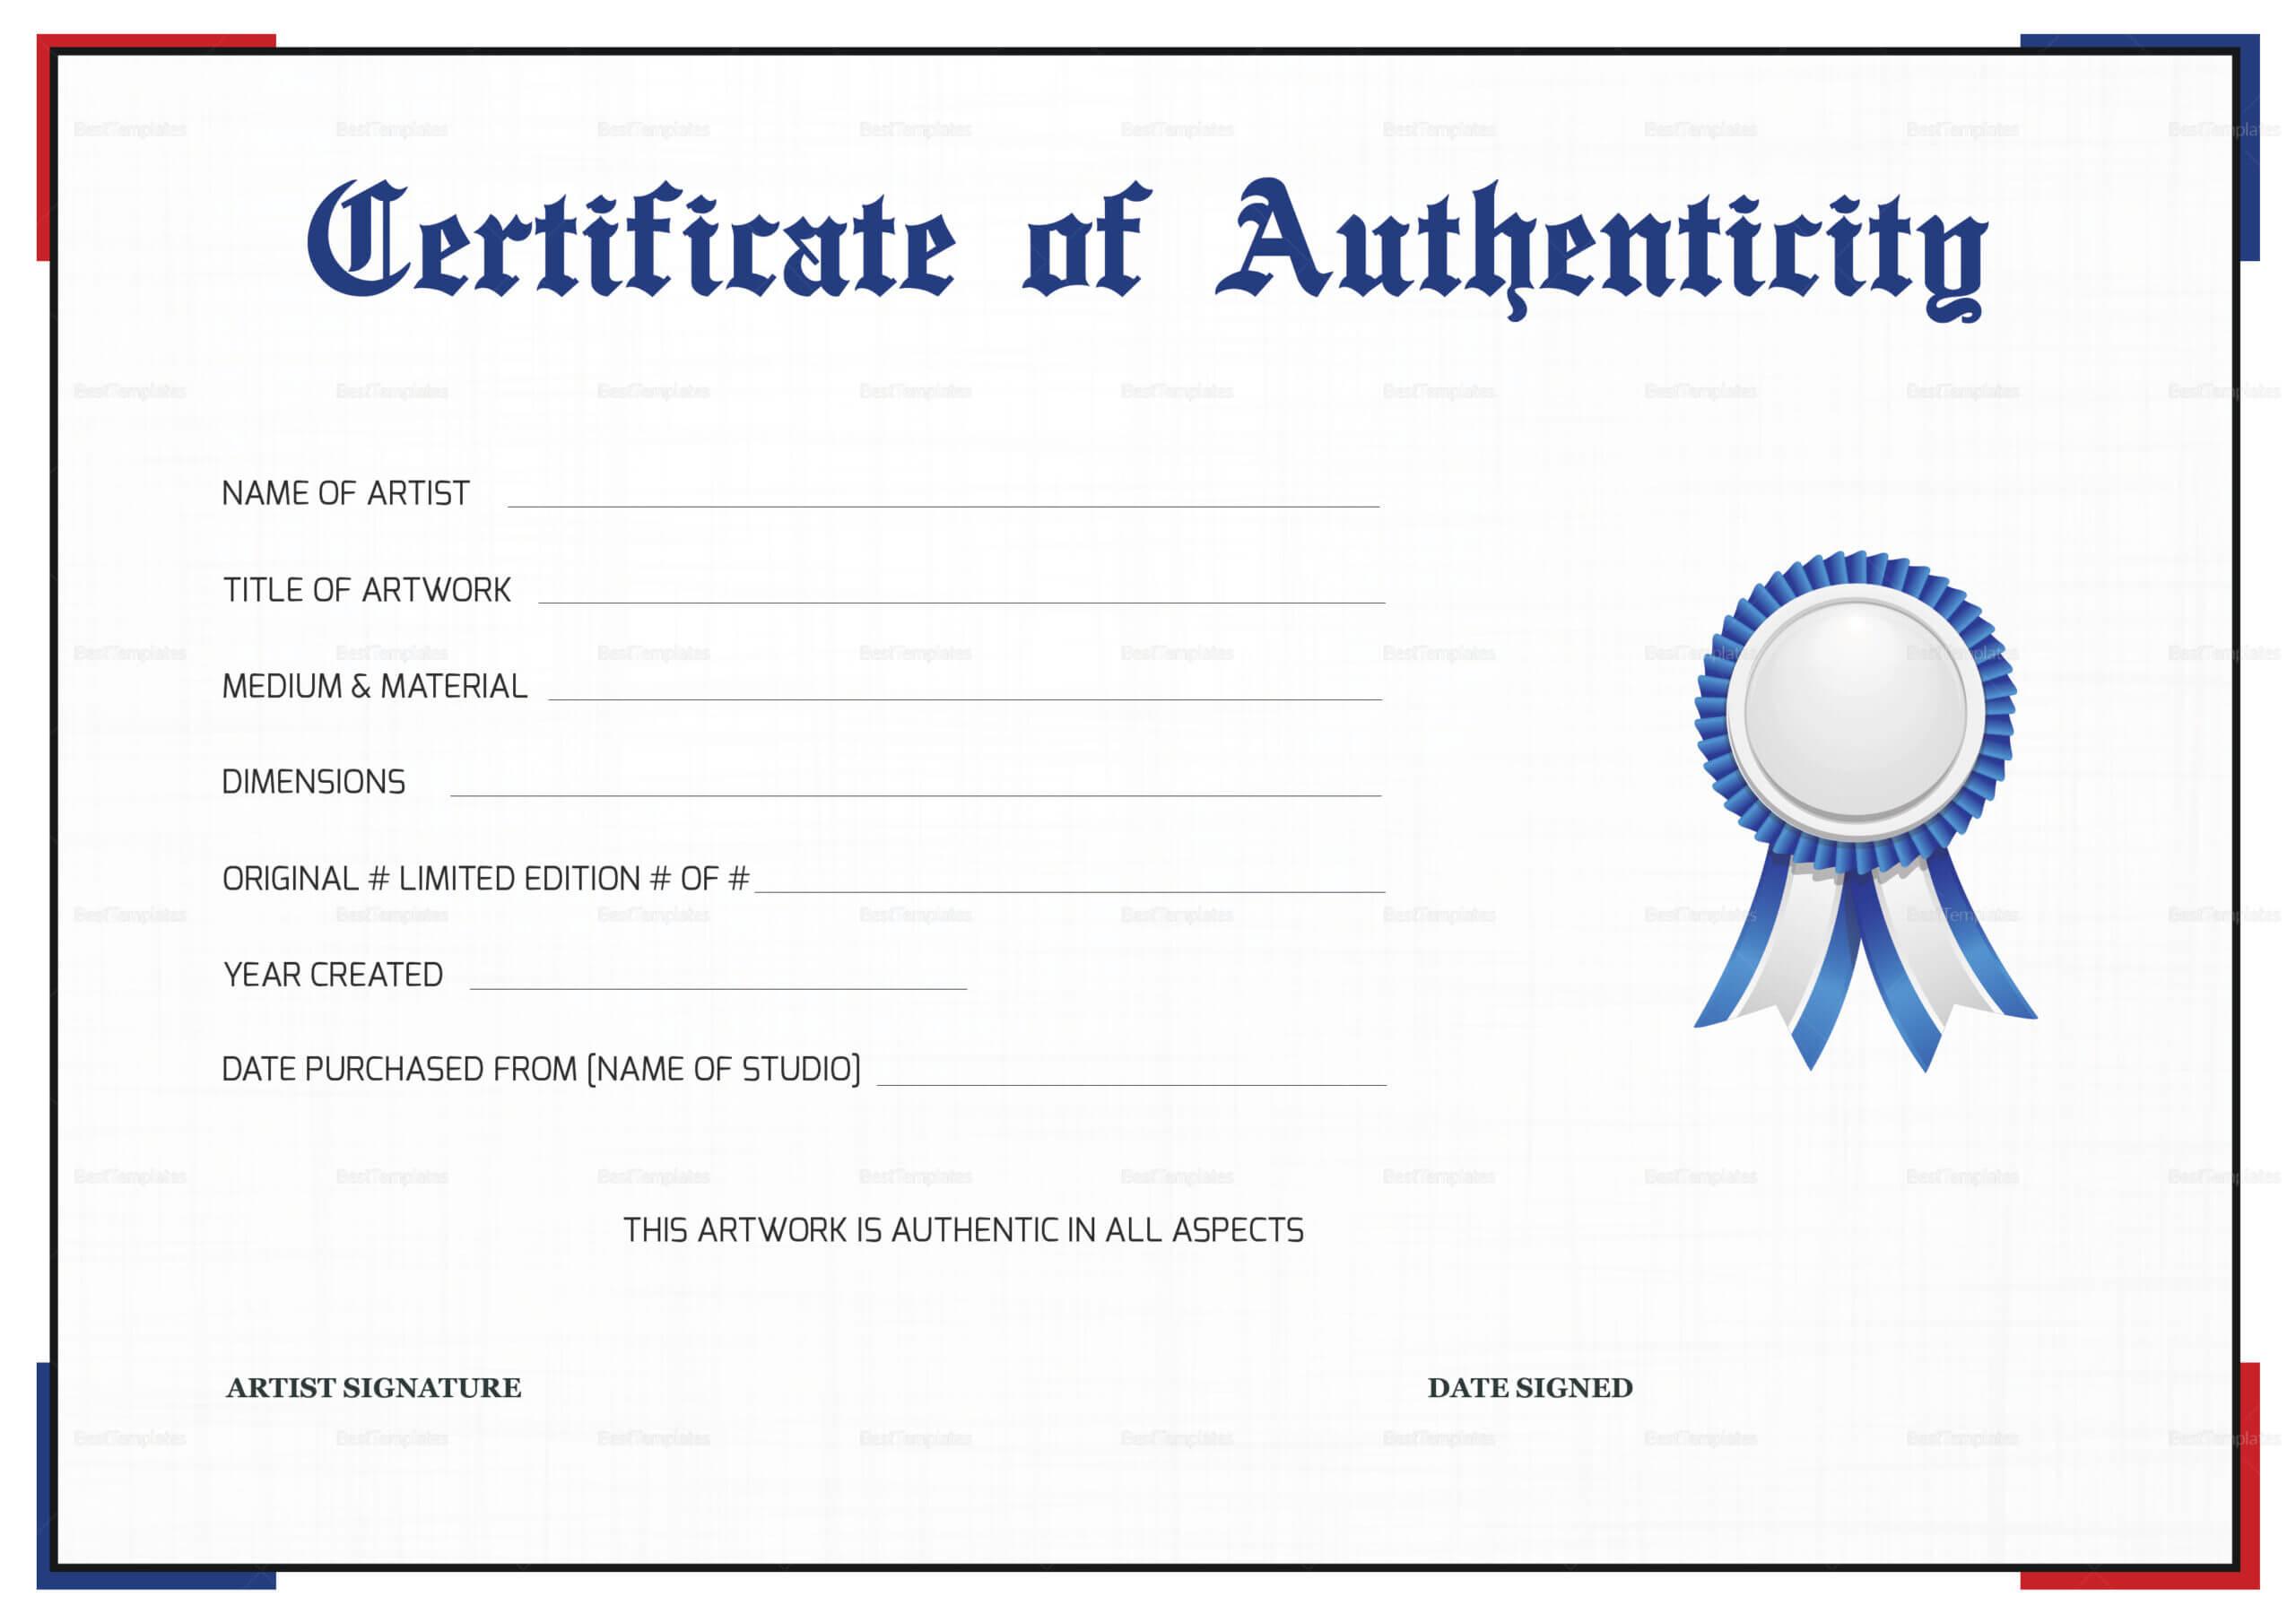 authenticity certificate template printable calep midnightpig artwork templates certification certificates regarding example participation gorgeous artists professional resume vancecountyfair unique emetonlineblog